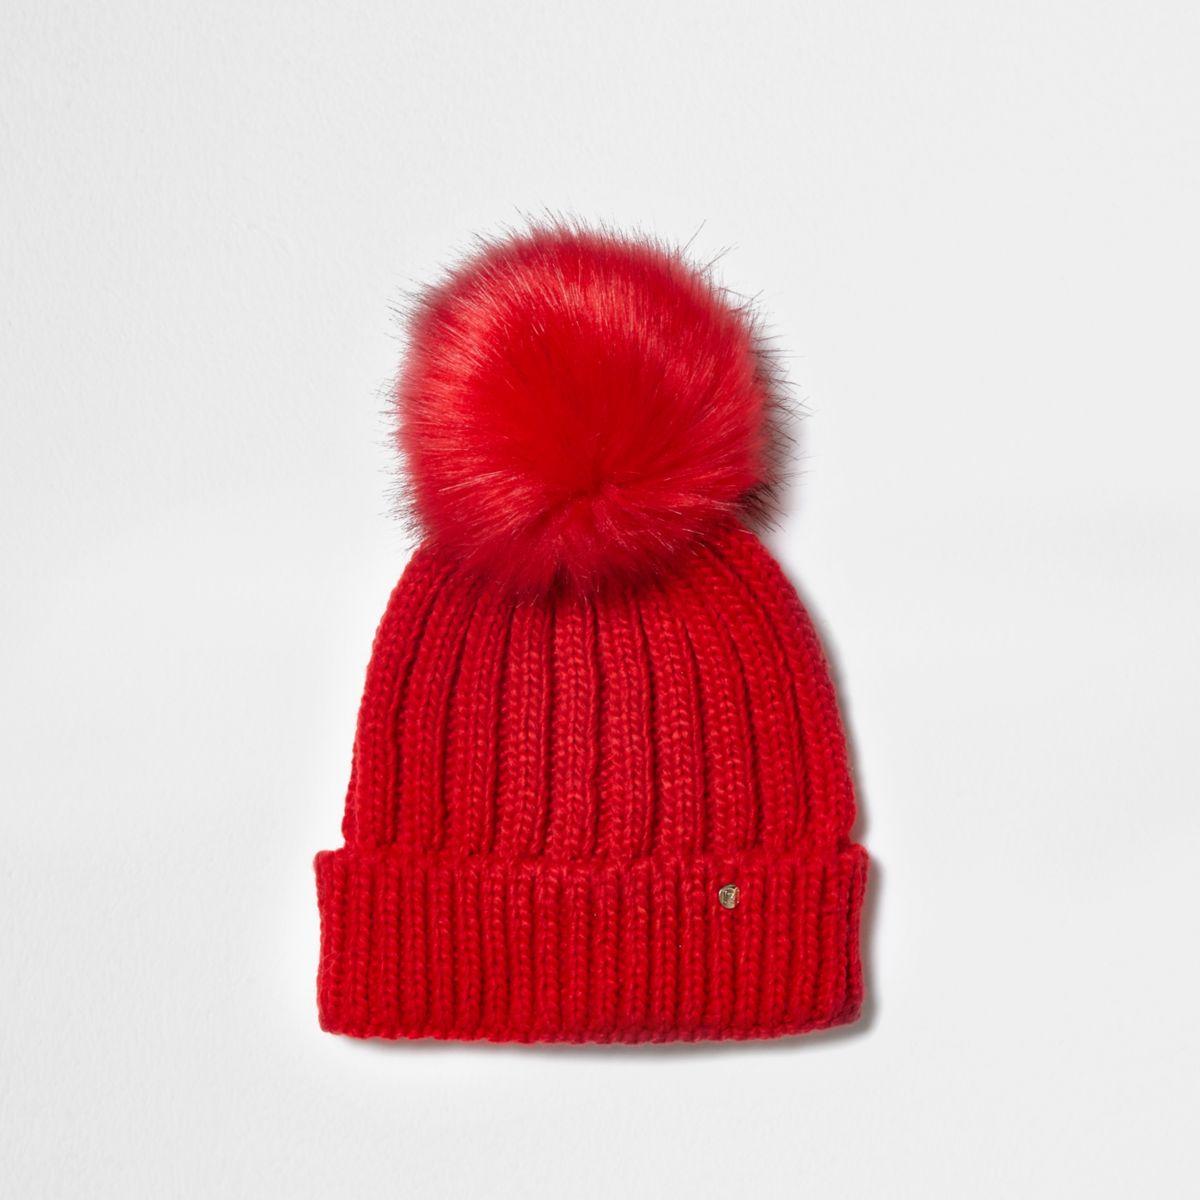 Red rib knit faux fur bobble beanie hat - Hats ...